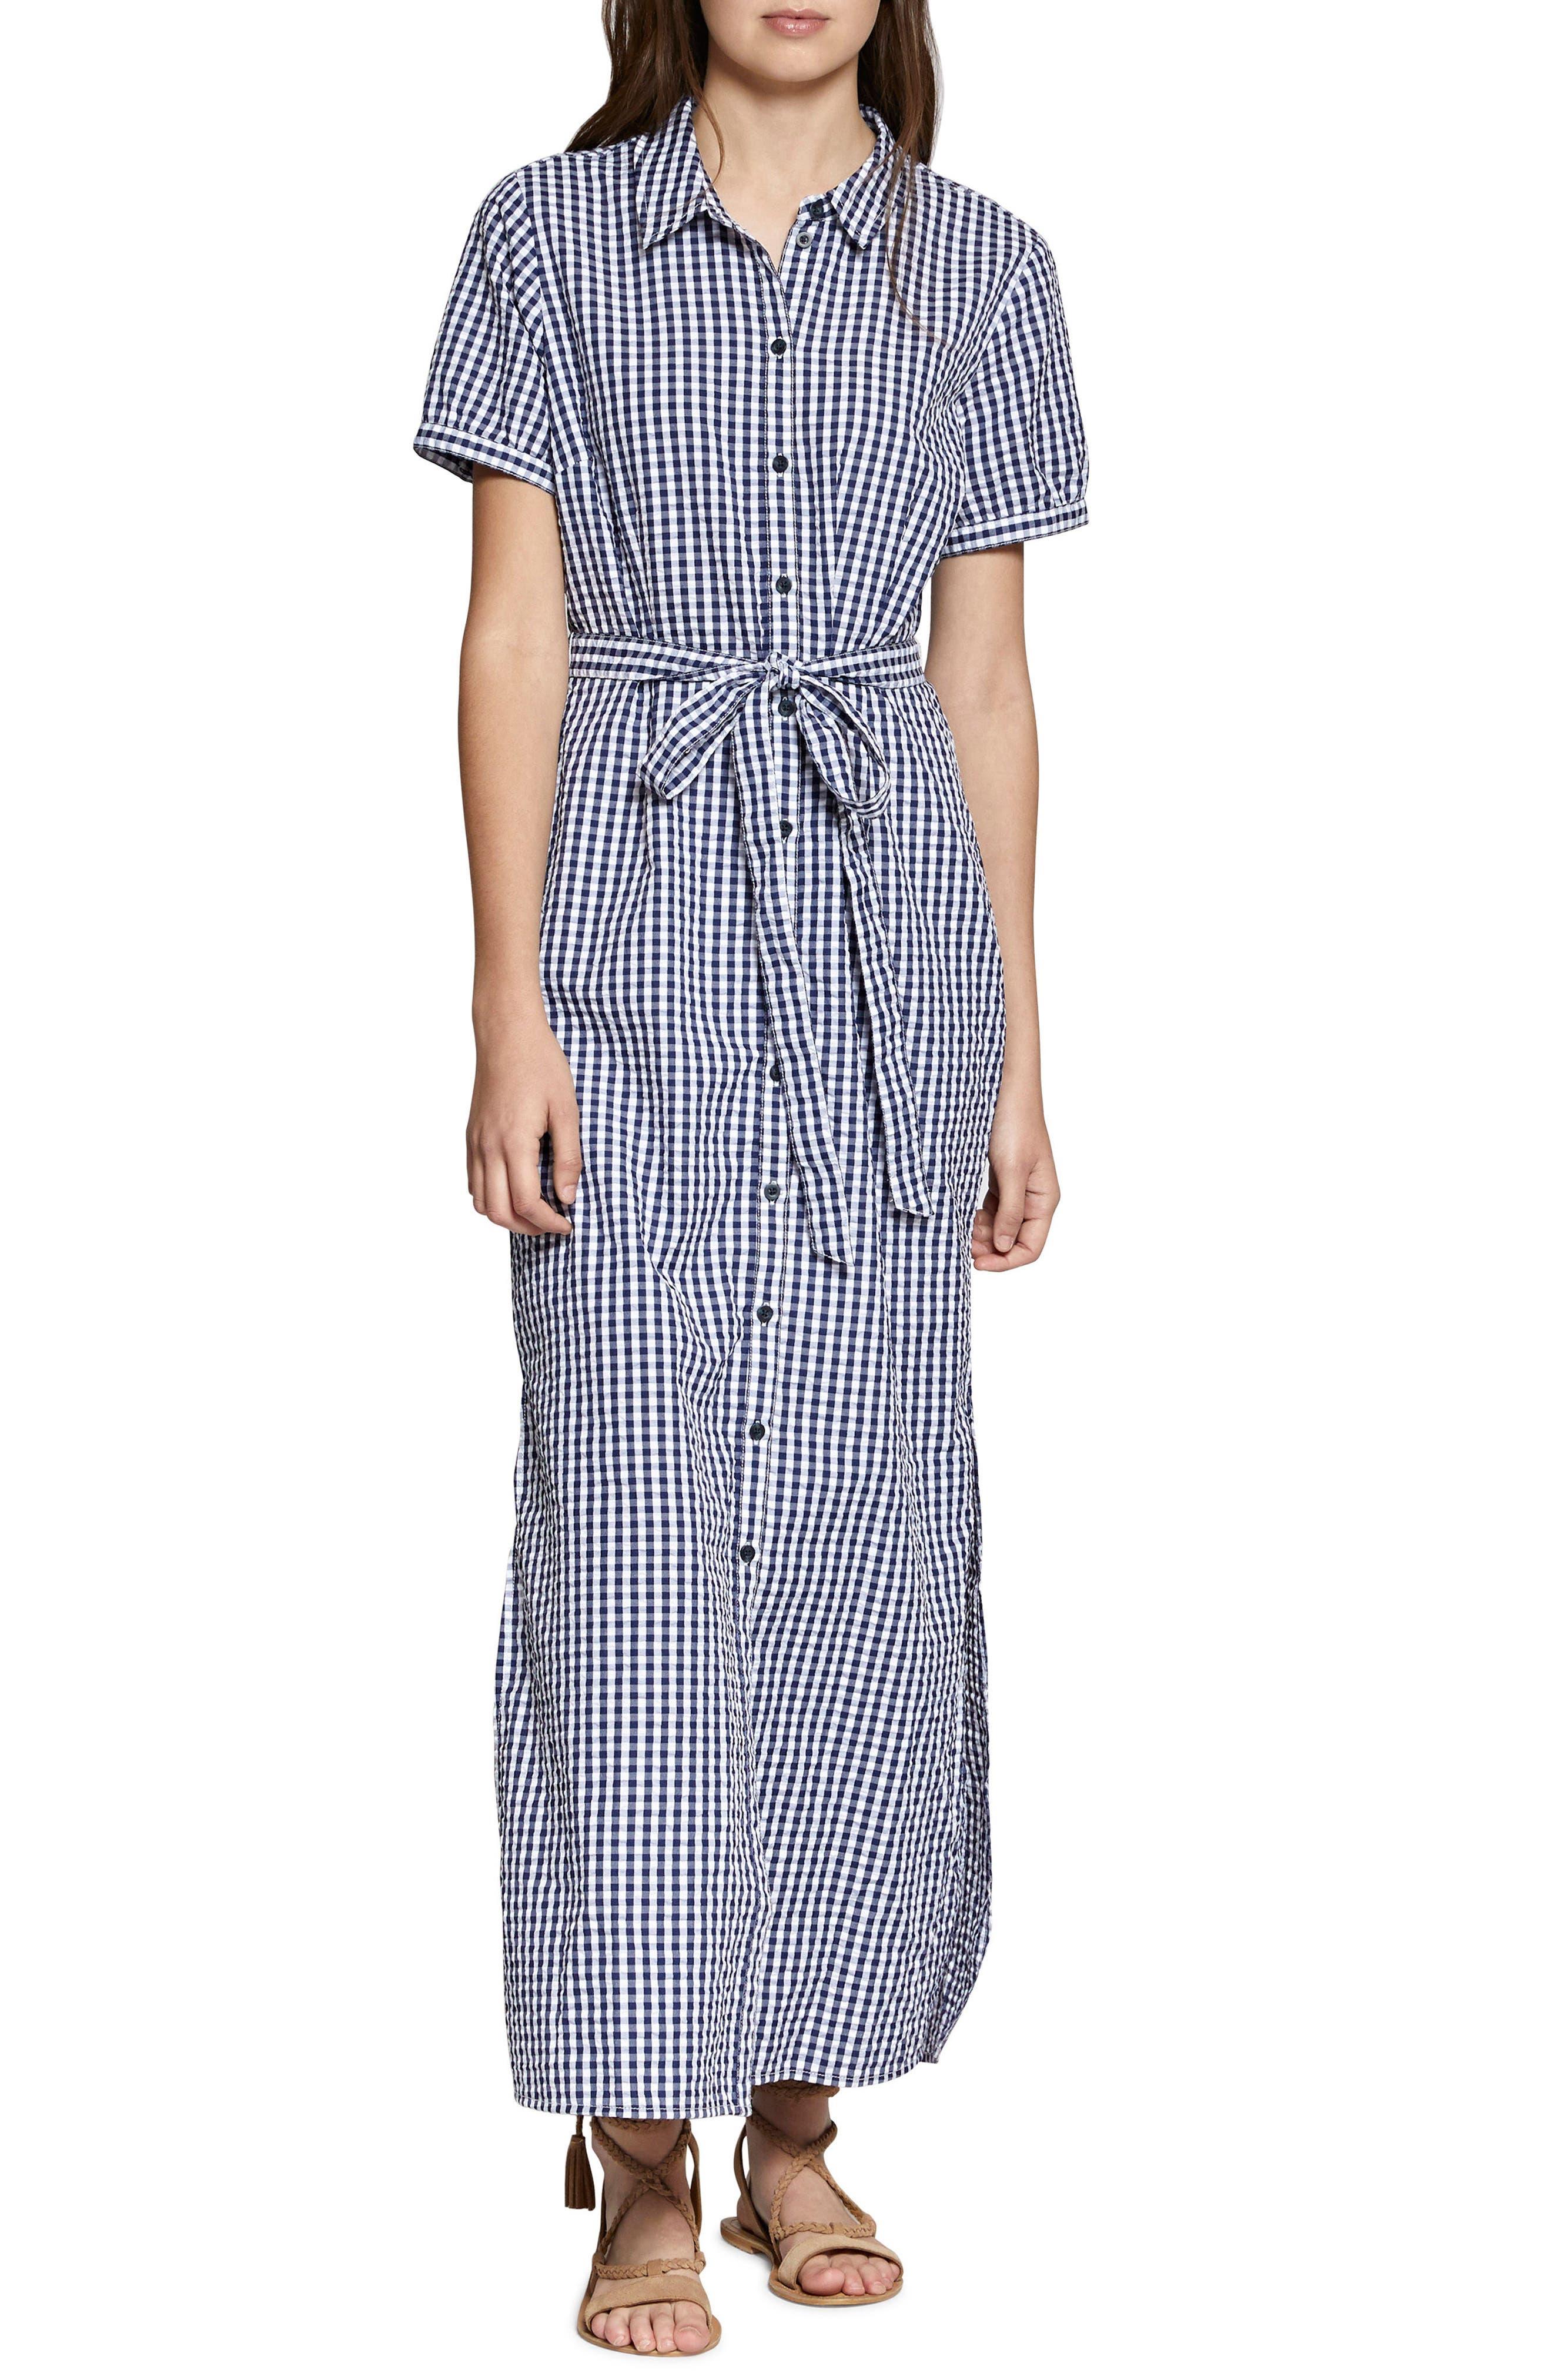 Blue Dawn Maxi Dress,                         Main,                         color, 452